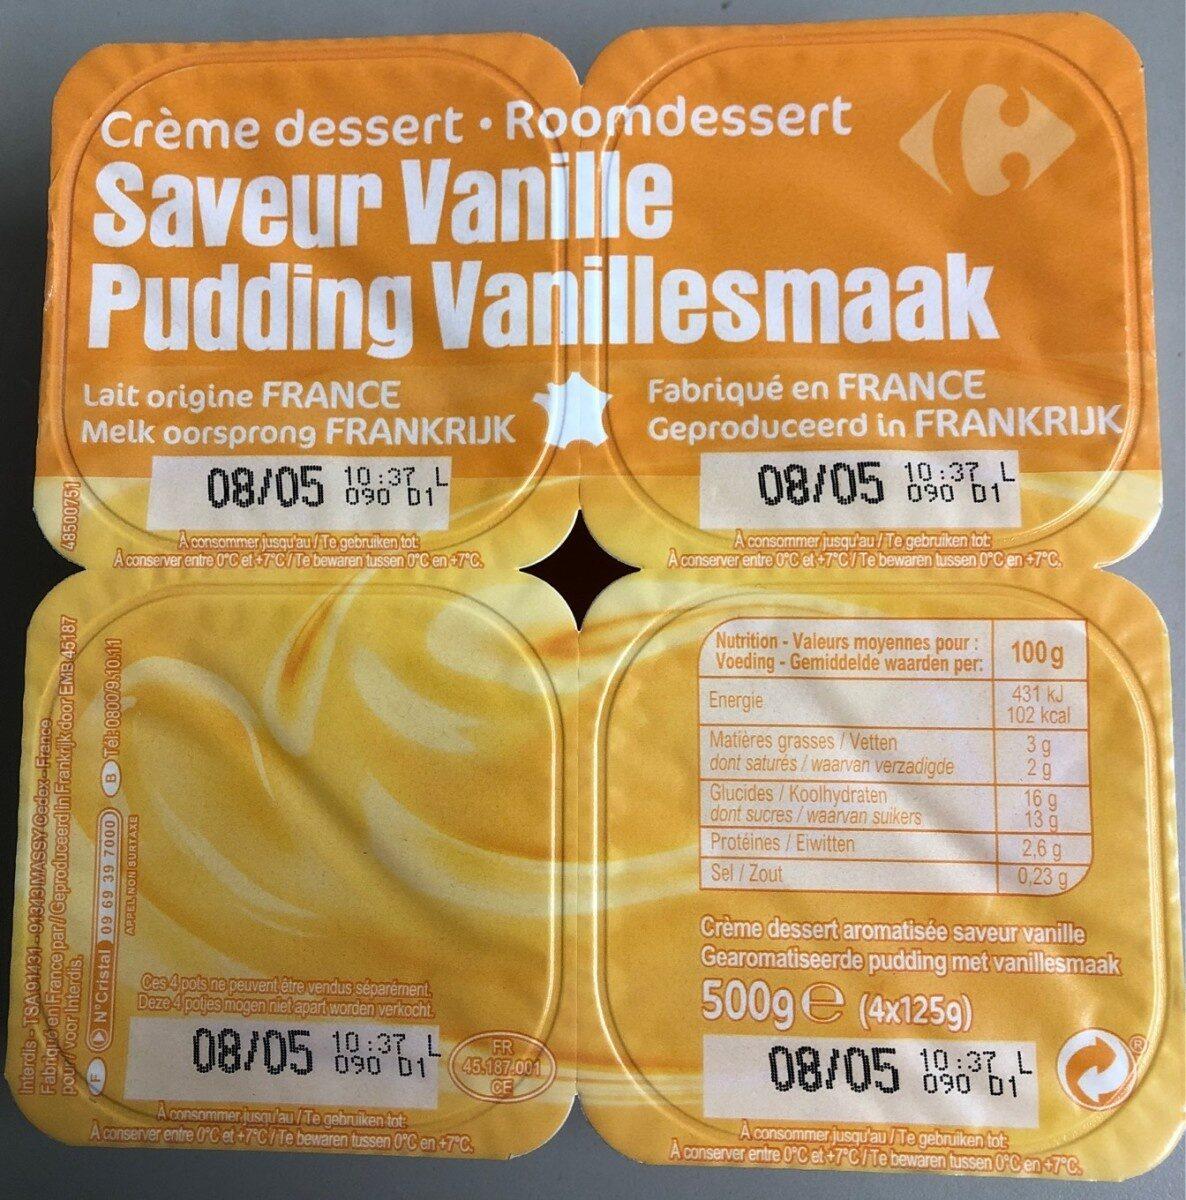 Pudding Vanillesmaak - Product